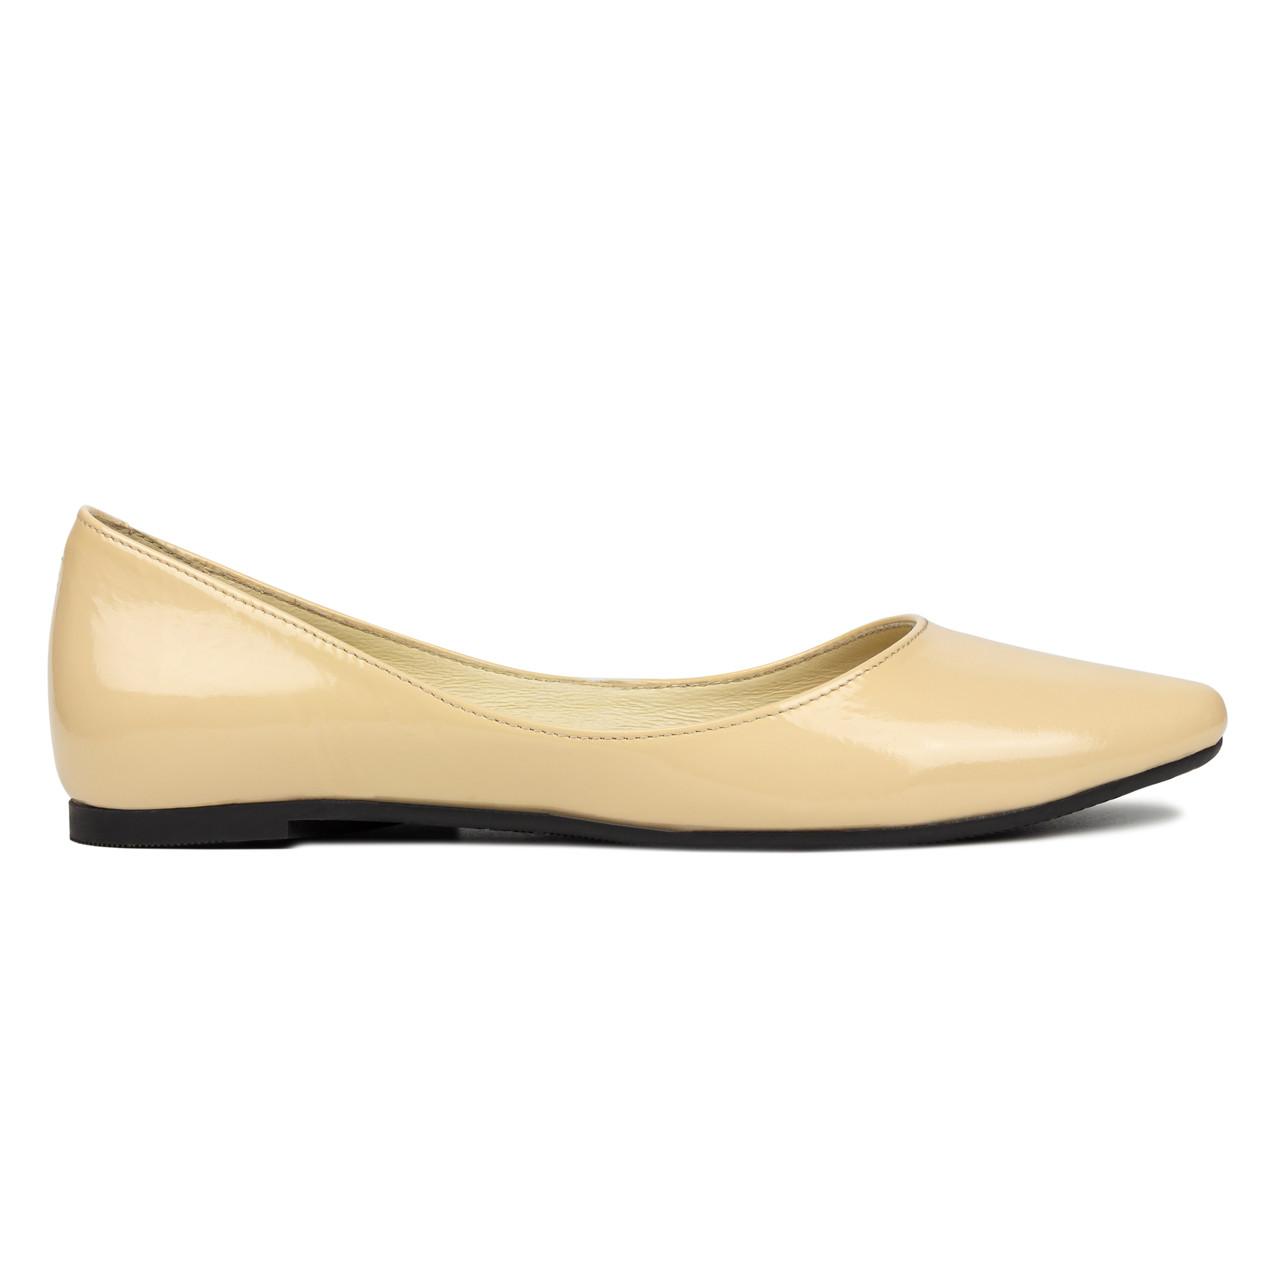 Балетки Woman's heel 37 бежевые (О-626)